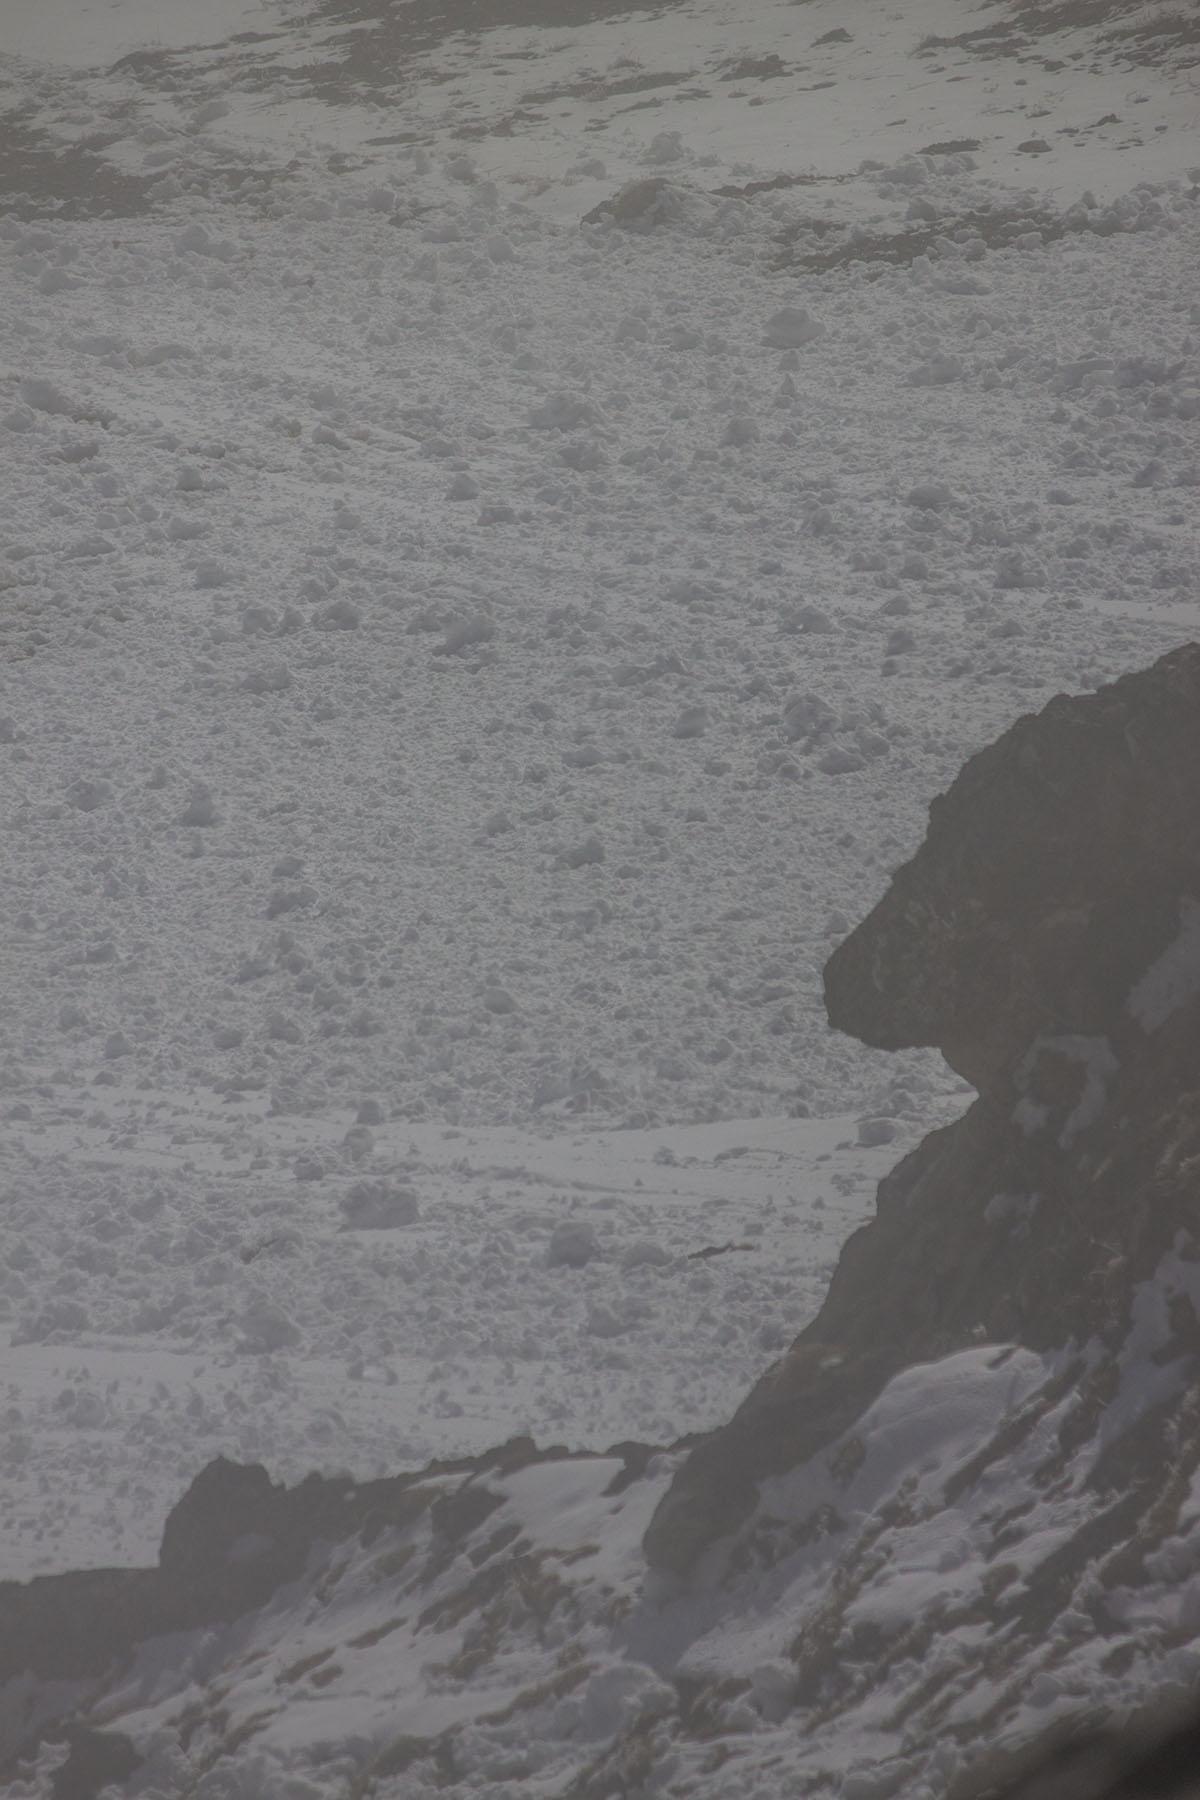 лавин на южном склоне хребта Дженту